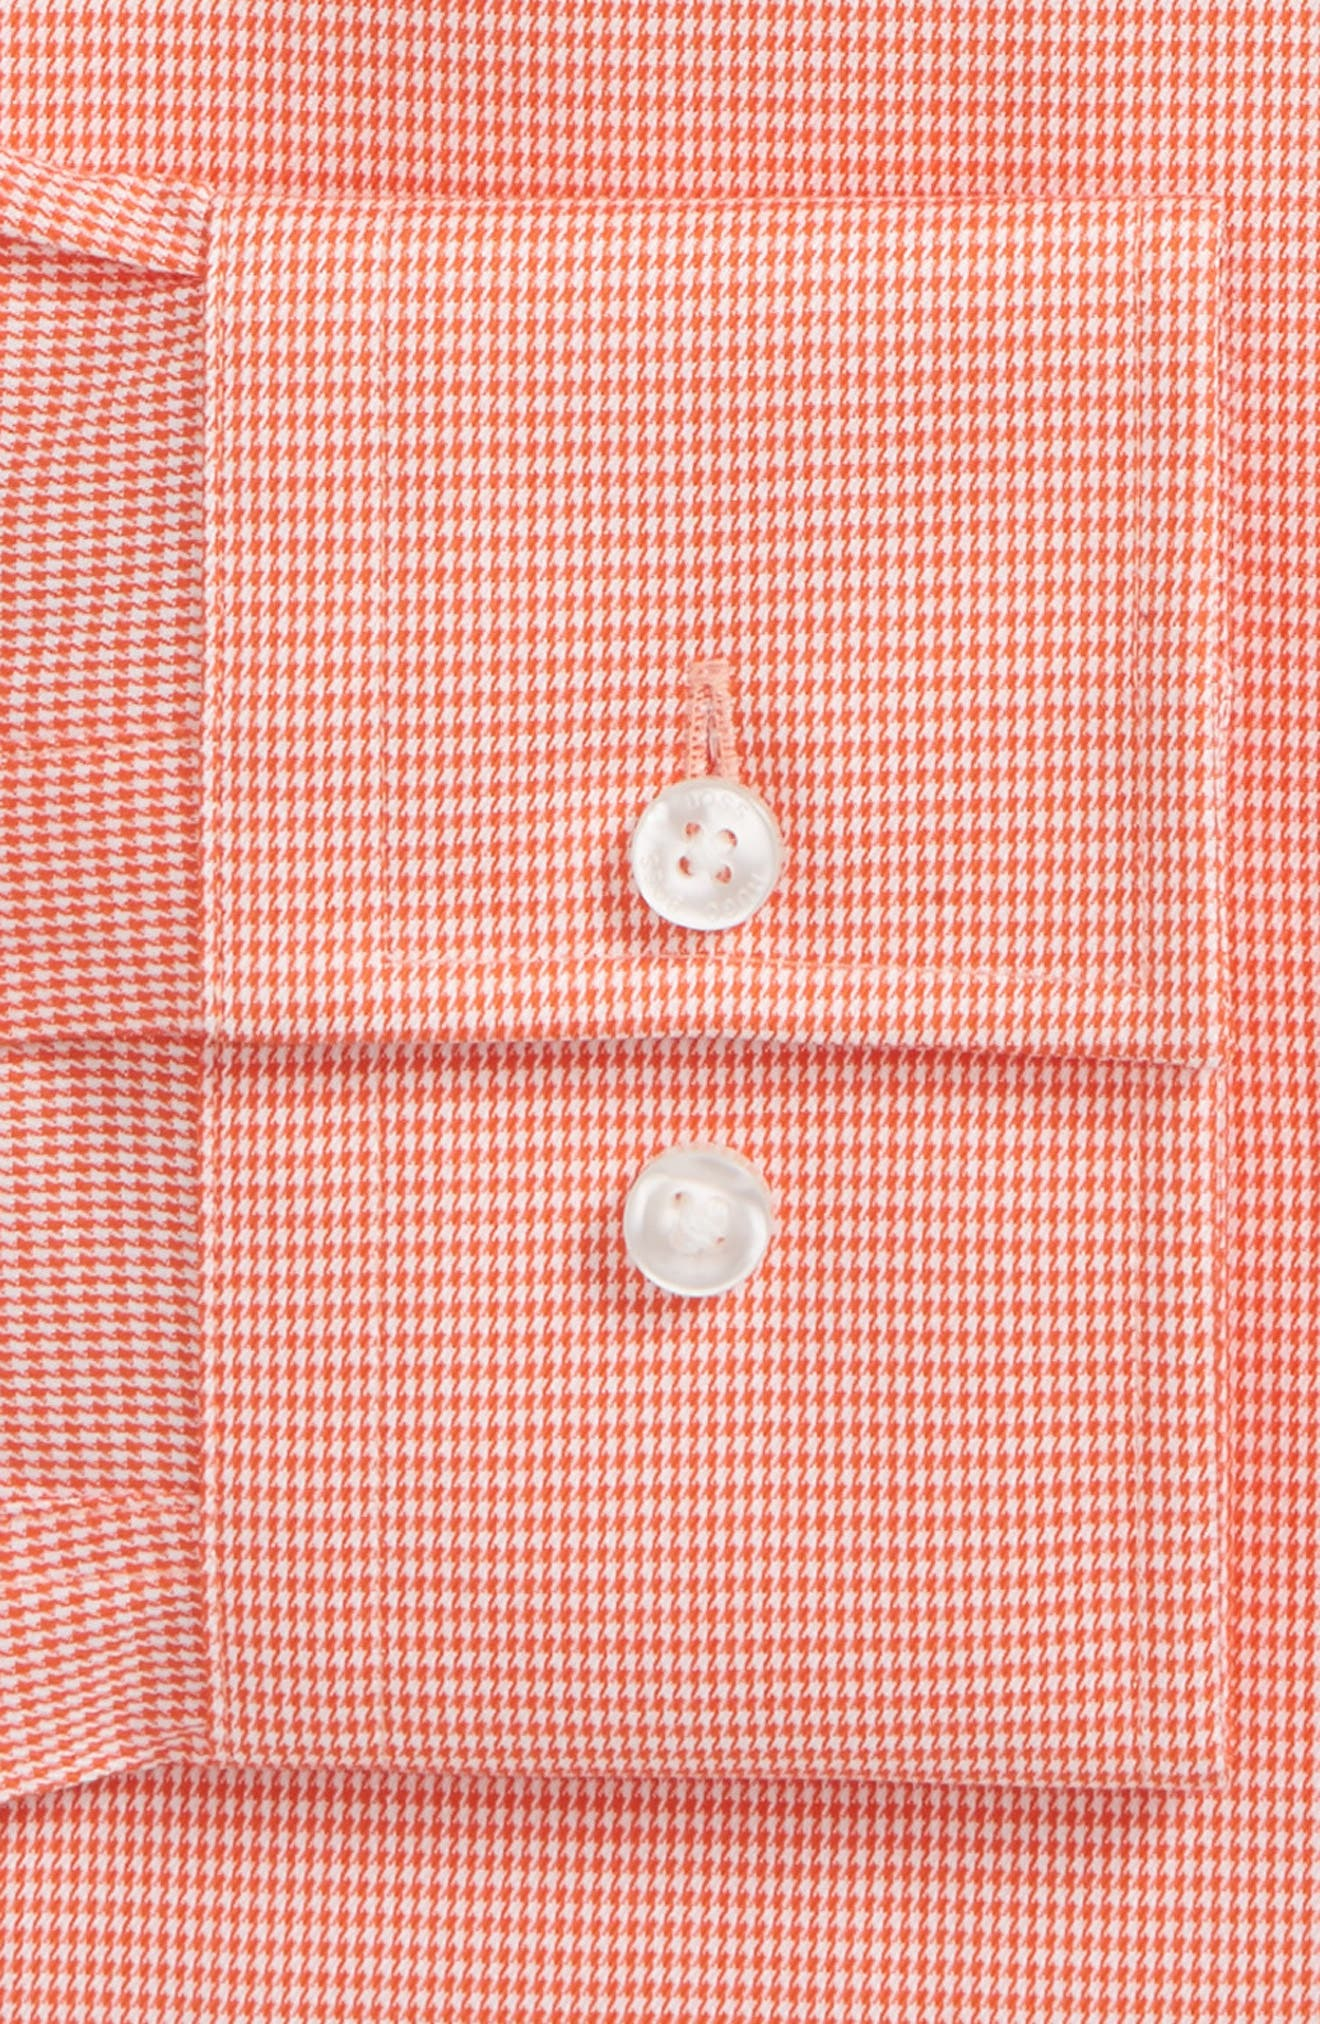 Jason Slim Fit Houndstooth Dress Shirt,                             Alternate thumbnail 6, color,                             813